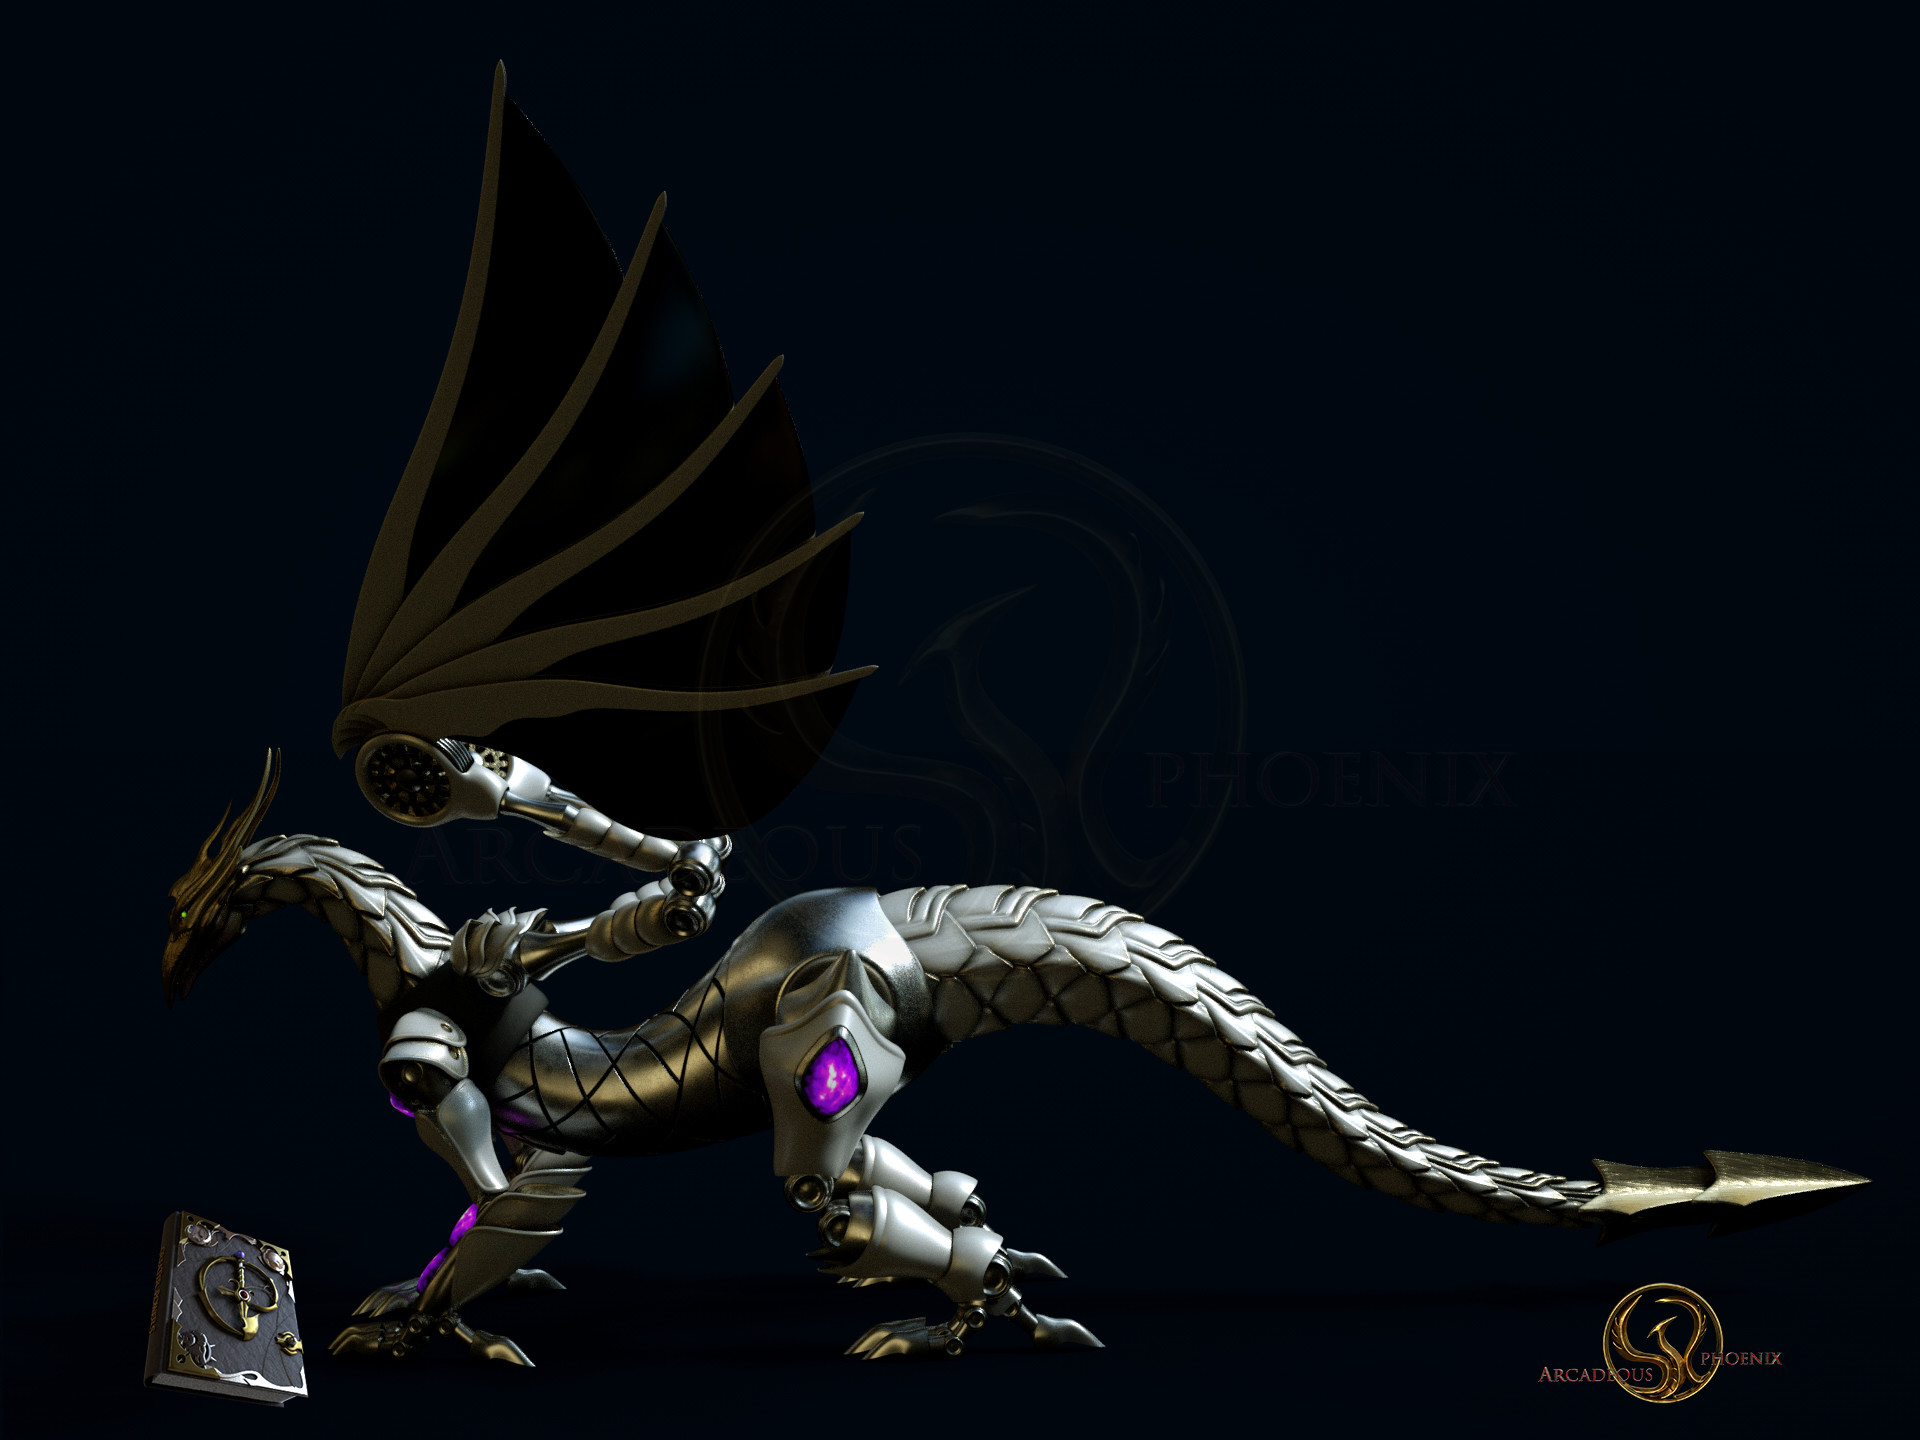 Arcadeous phoenix 6